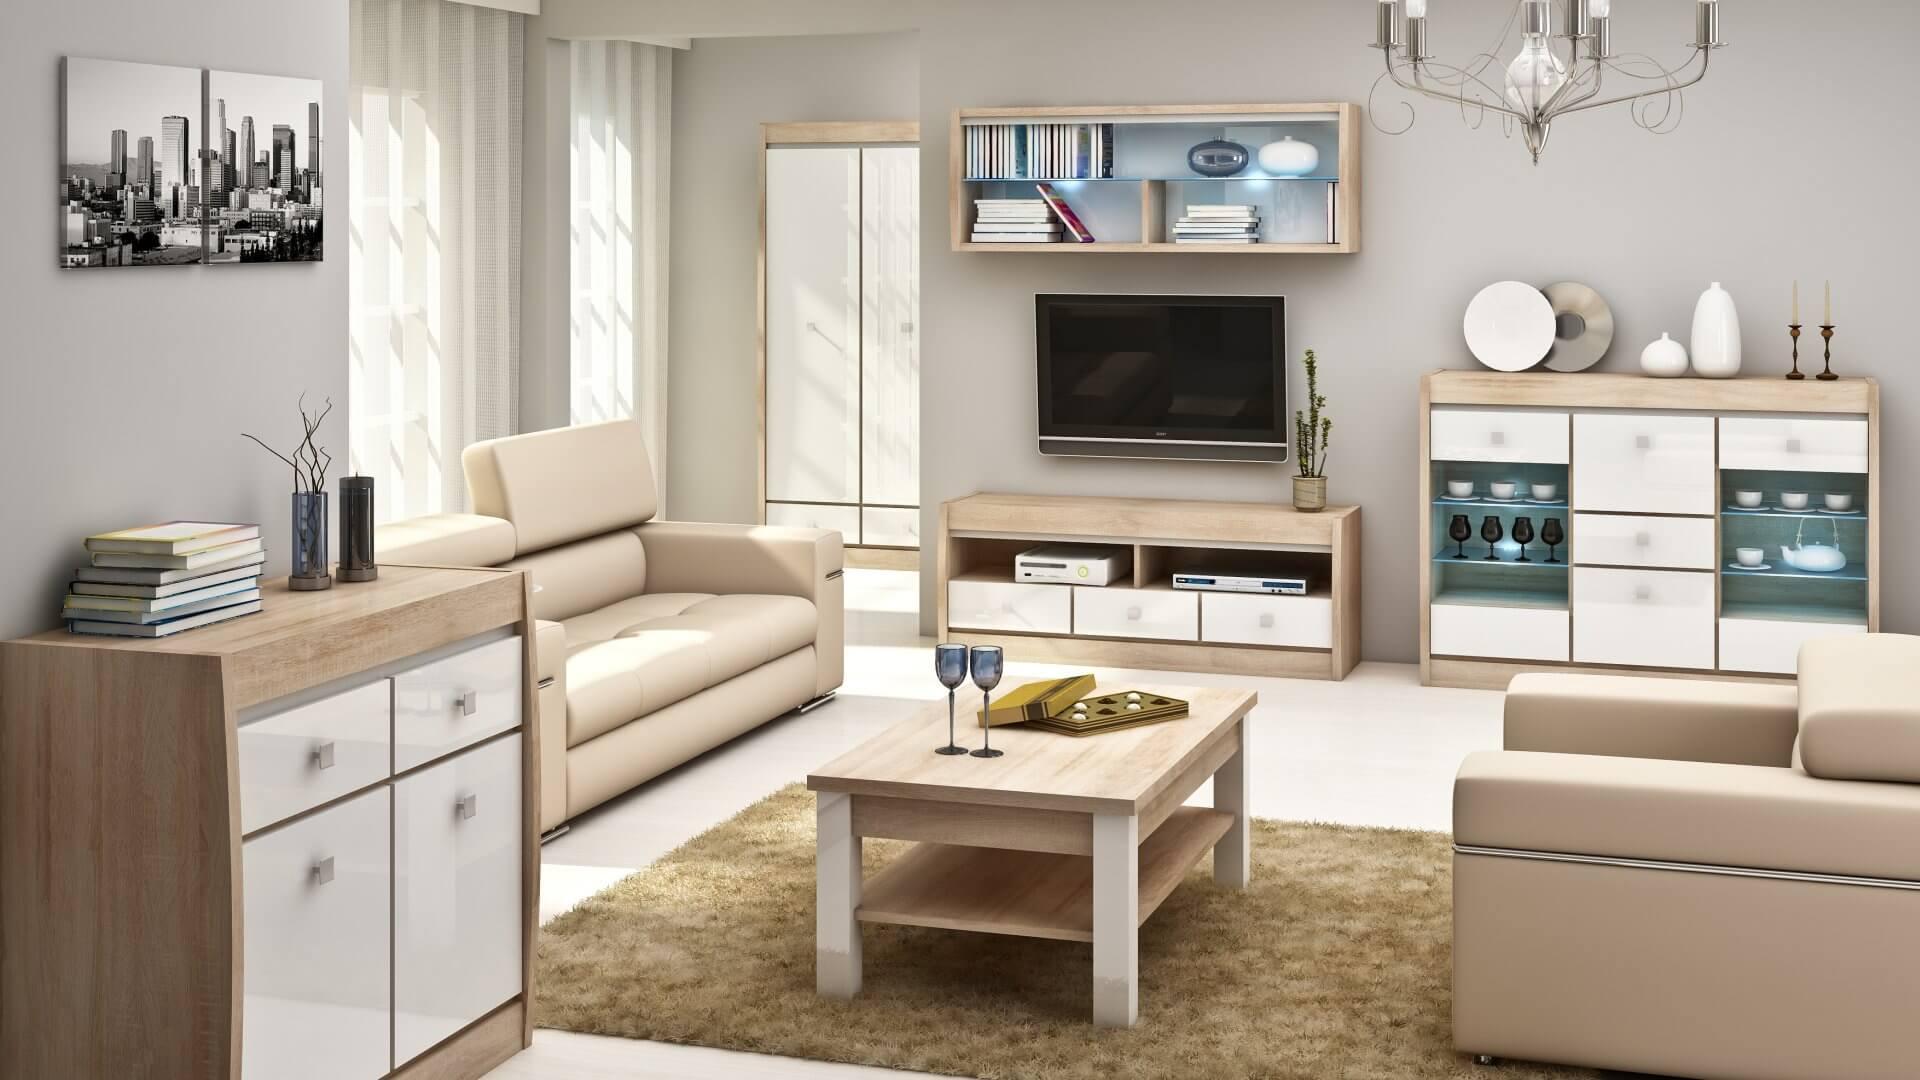 3D Emergency Service - Interior visualization - living room, kitchen ...